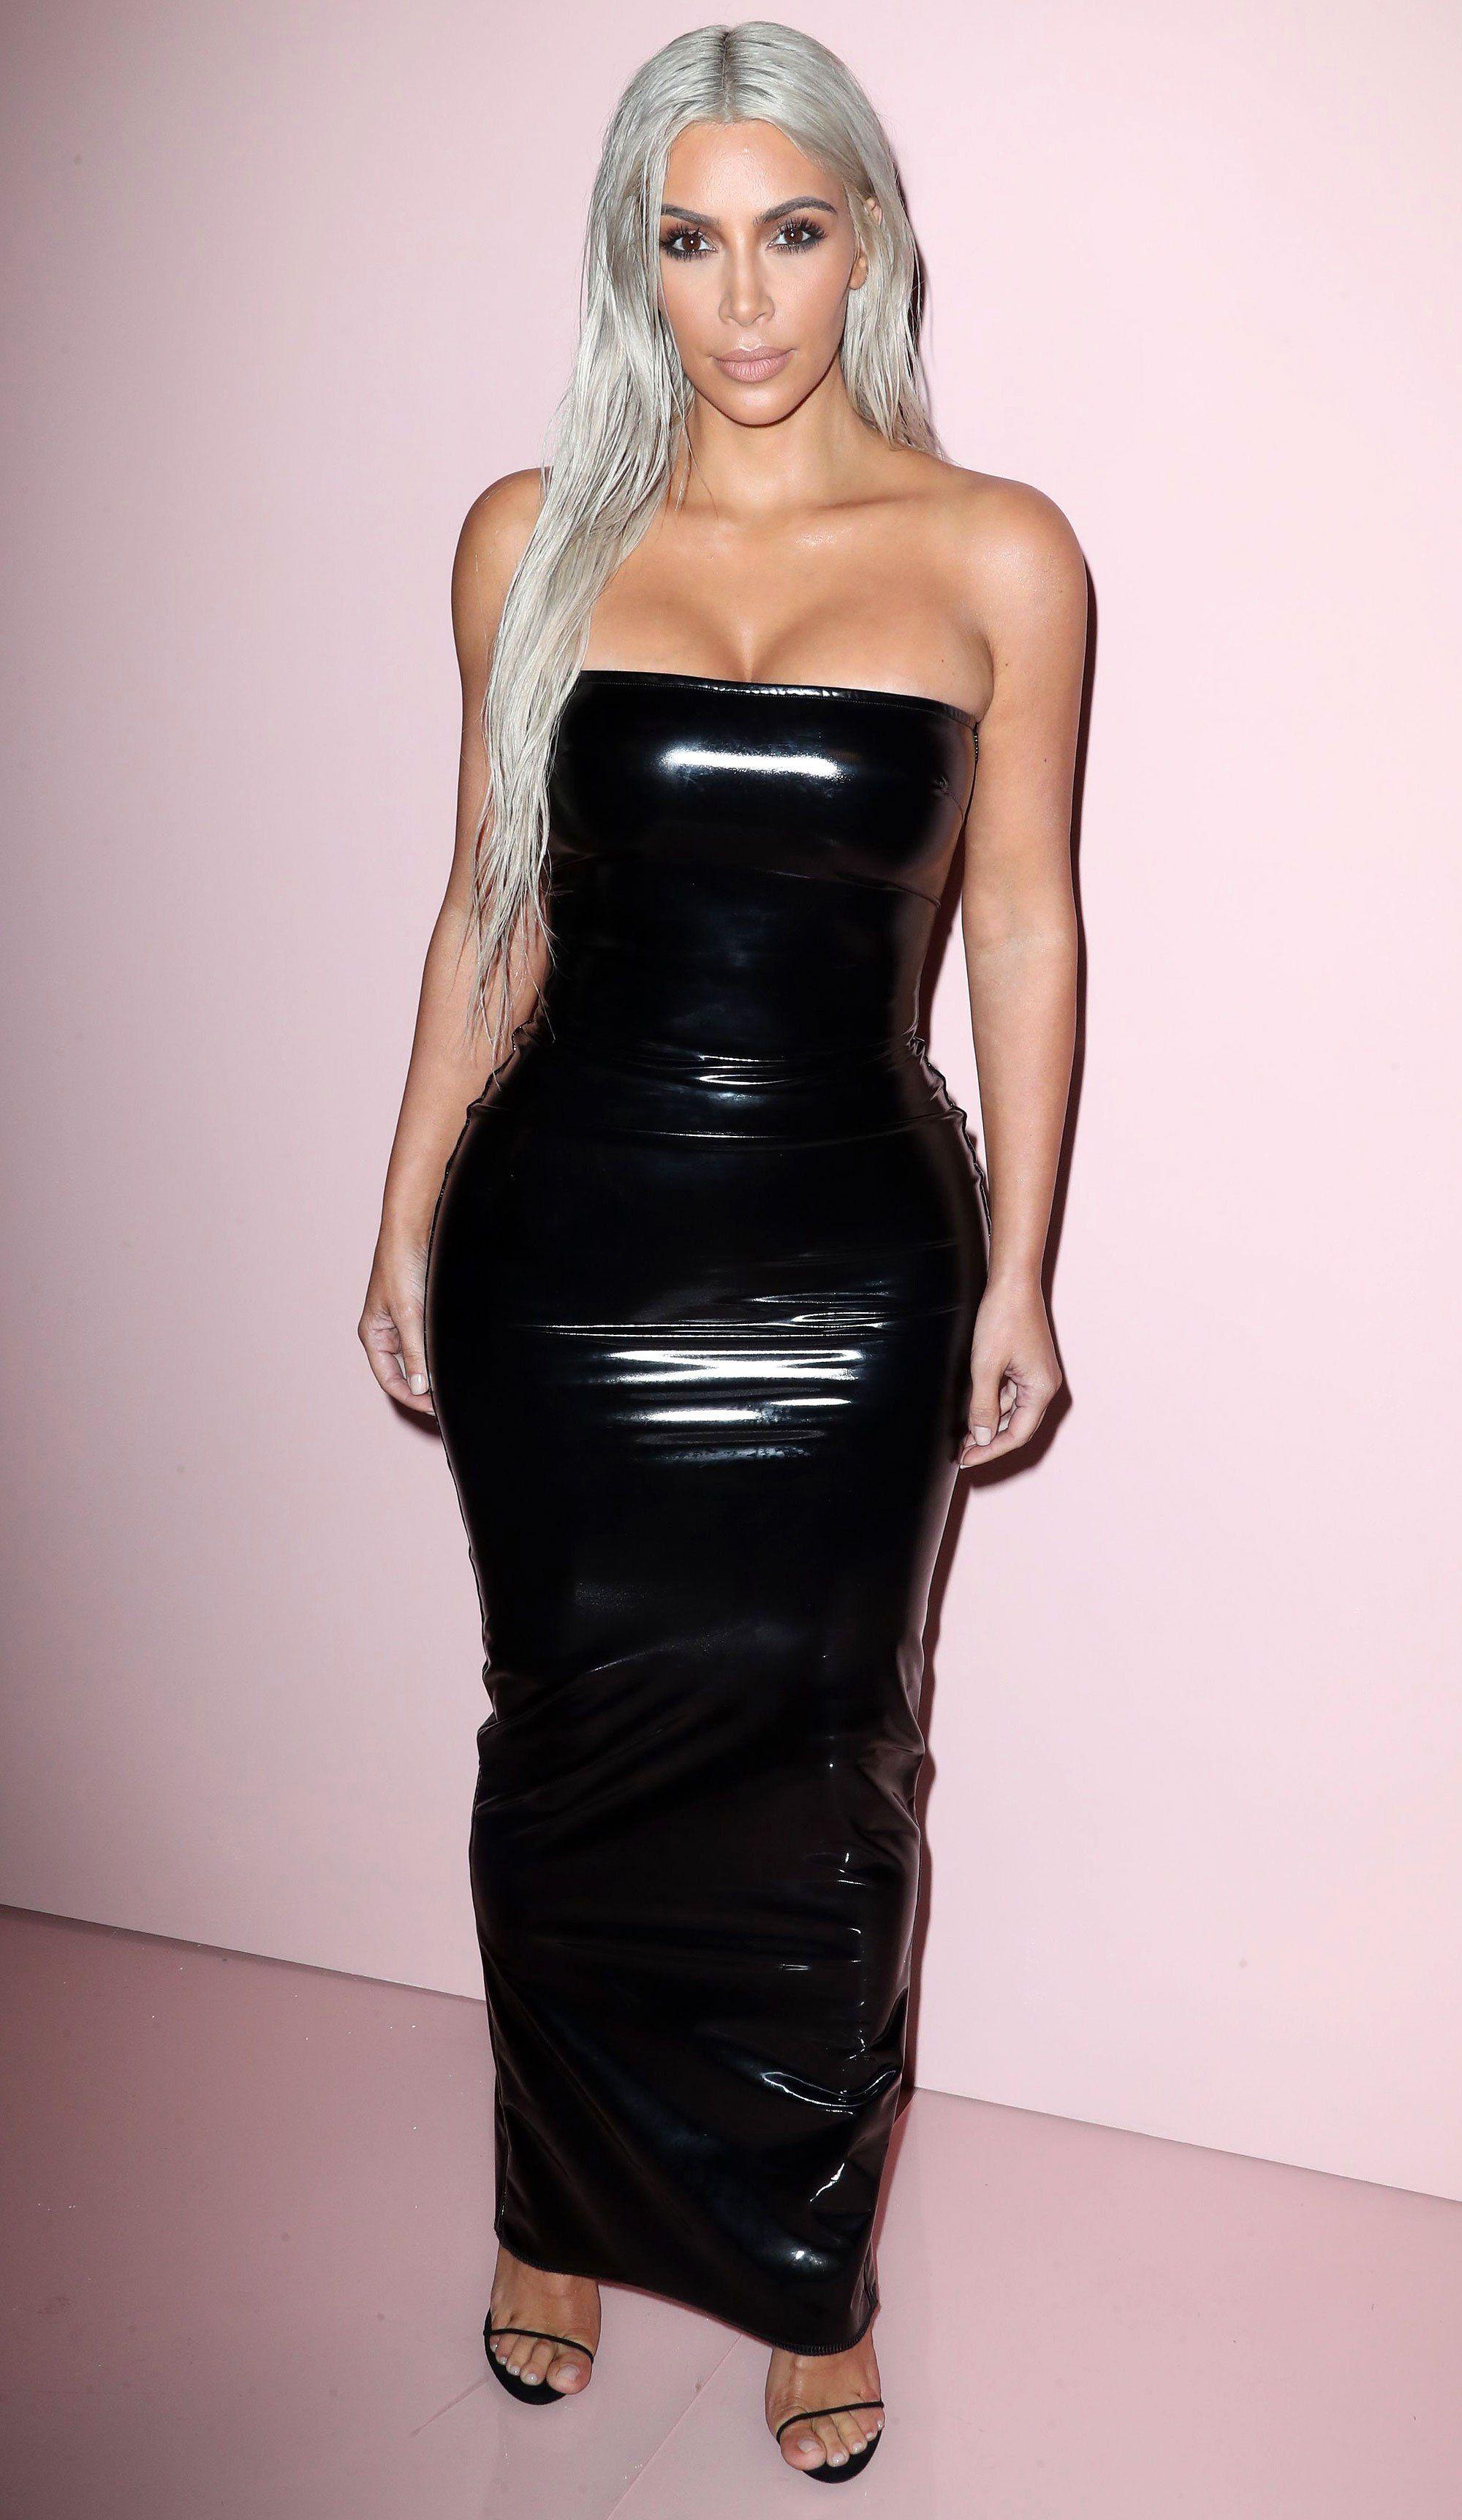 76965bc44f13 Kim Kardashian Makes First Red Carpet Appearance (Sporting Silver ...